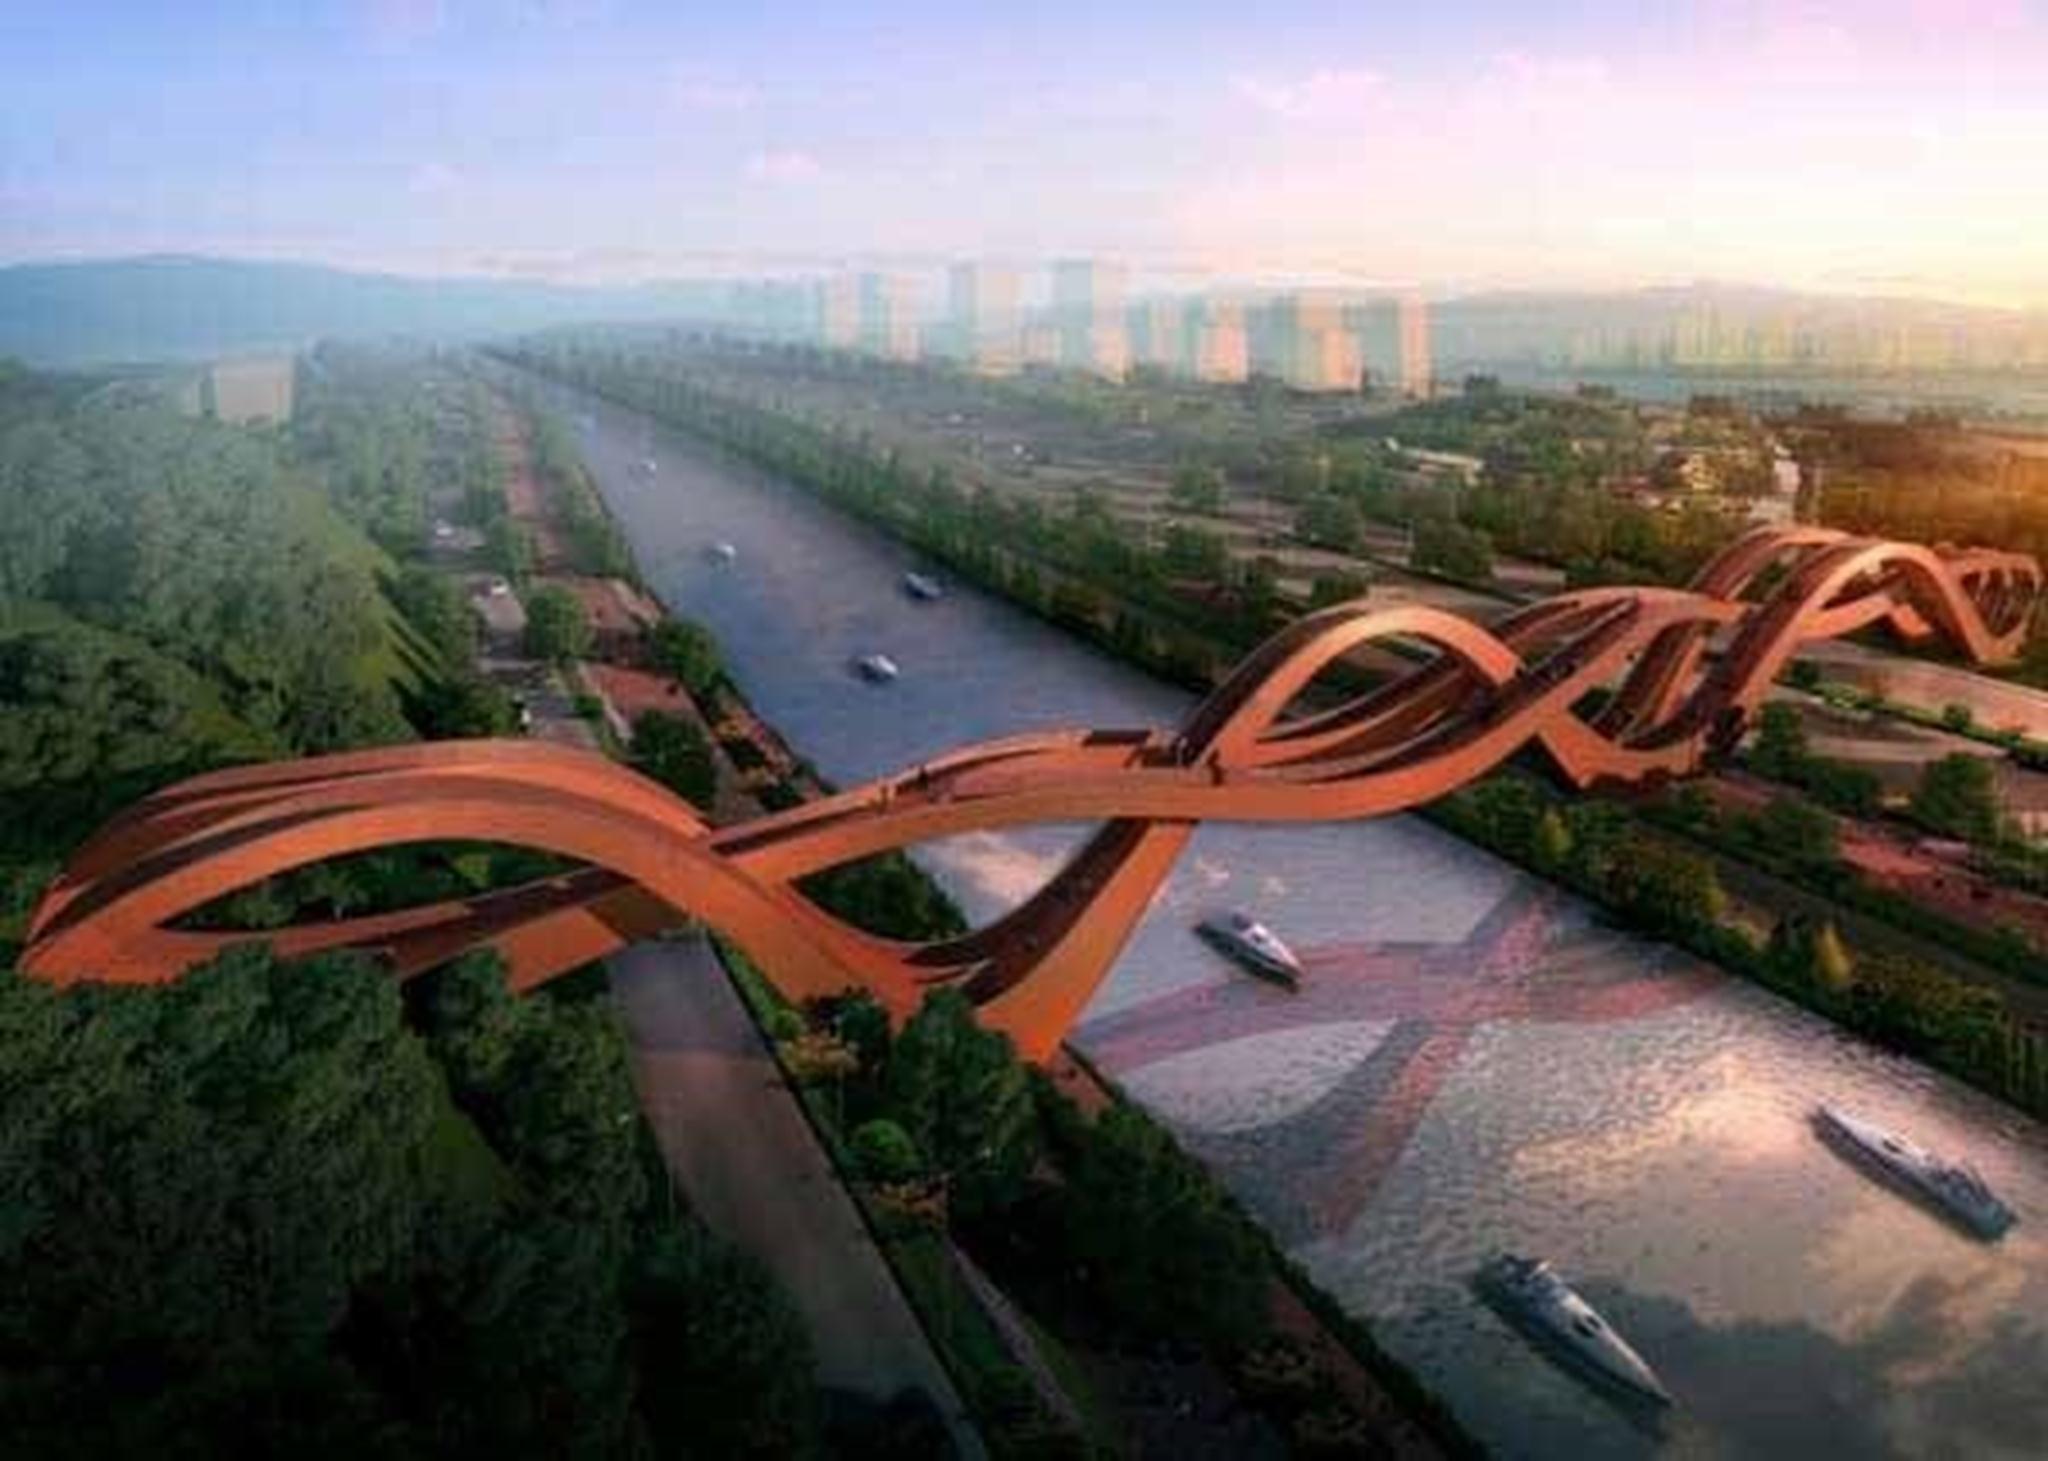 Cầu rồng King Kong, Trung Quốc